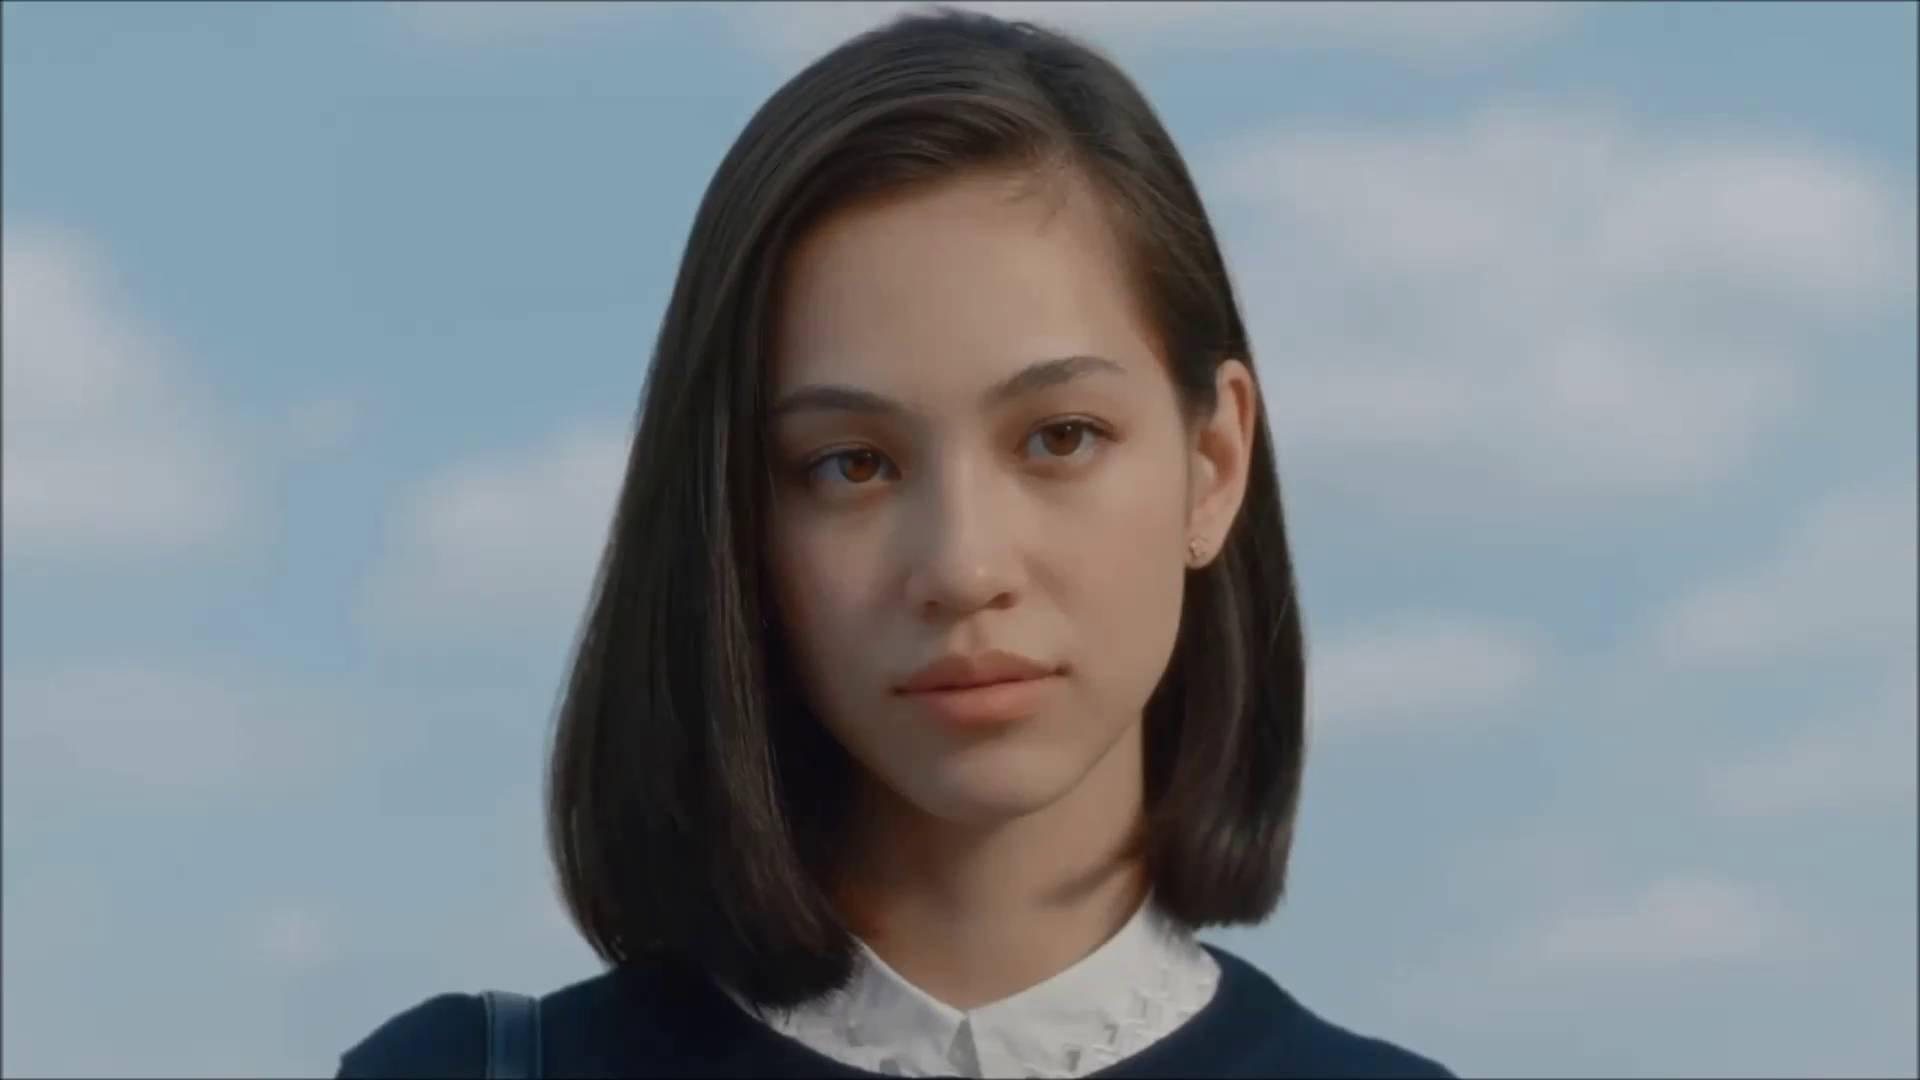 img 5a6f12abf3026.png?resize=1200,630 - 女子が憧れる髪型NO.1!水原希子のワンレンボブが似合う顔の系統は?